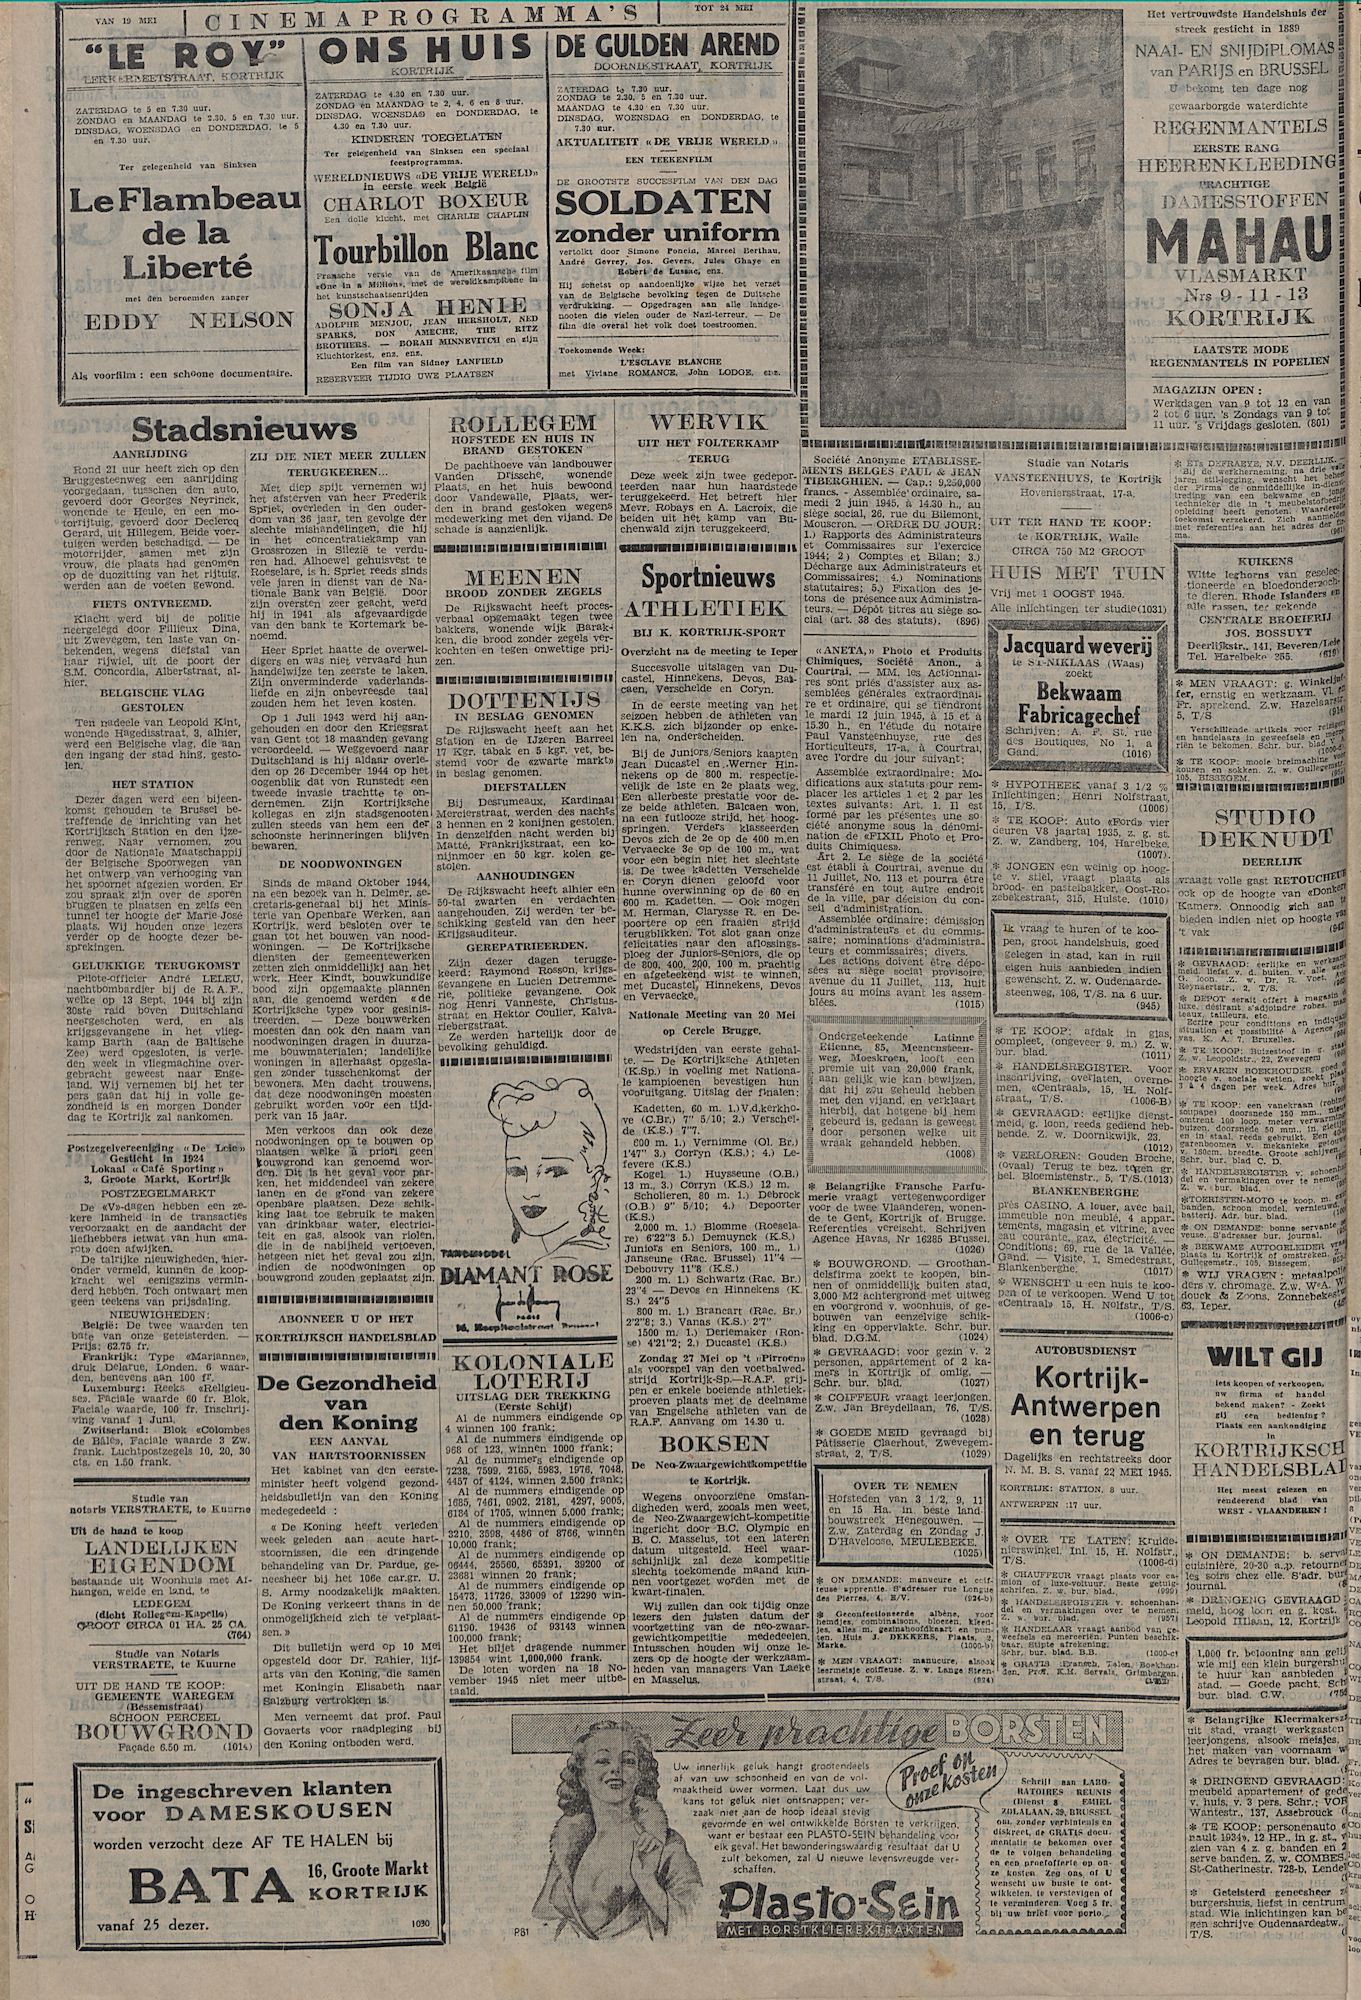 Kortrijksch Handelsblad 23 mei 1945 Nr41 p2